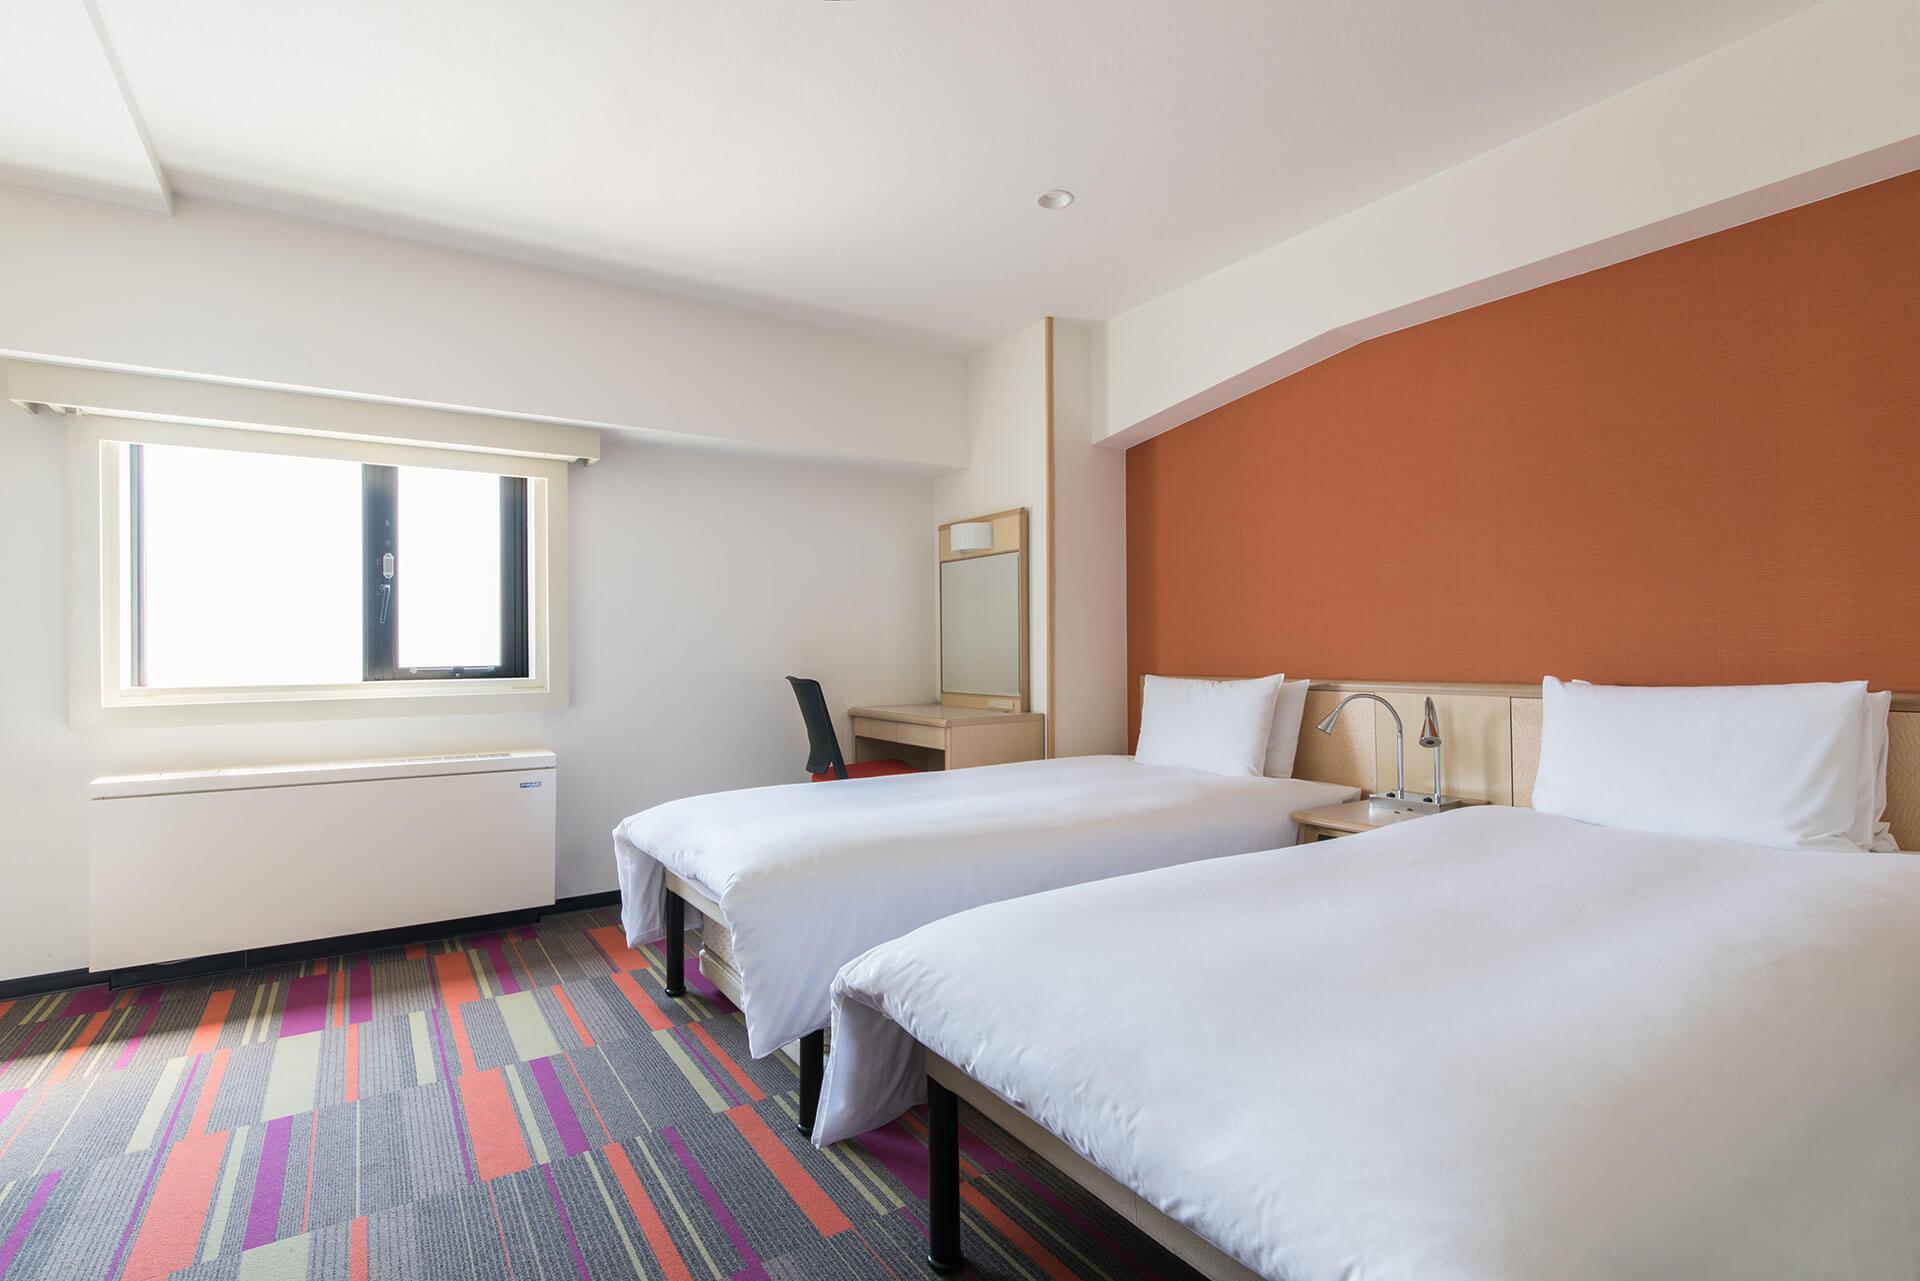 theb_sangenjaya_guestroom2.jpg